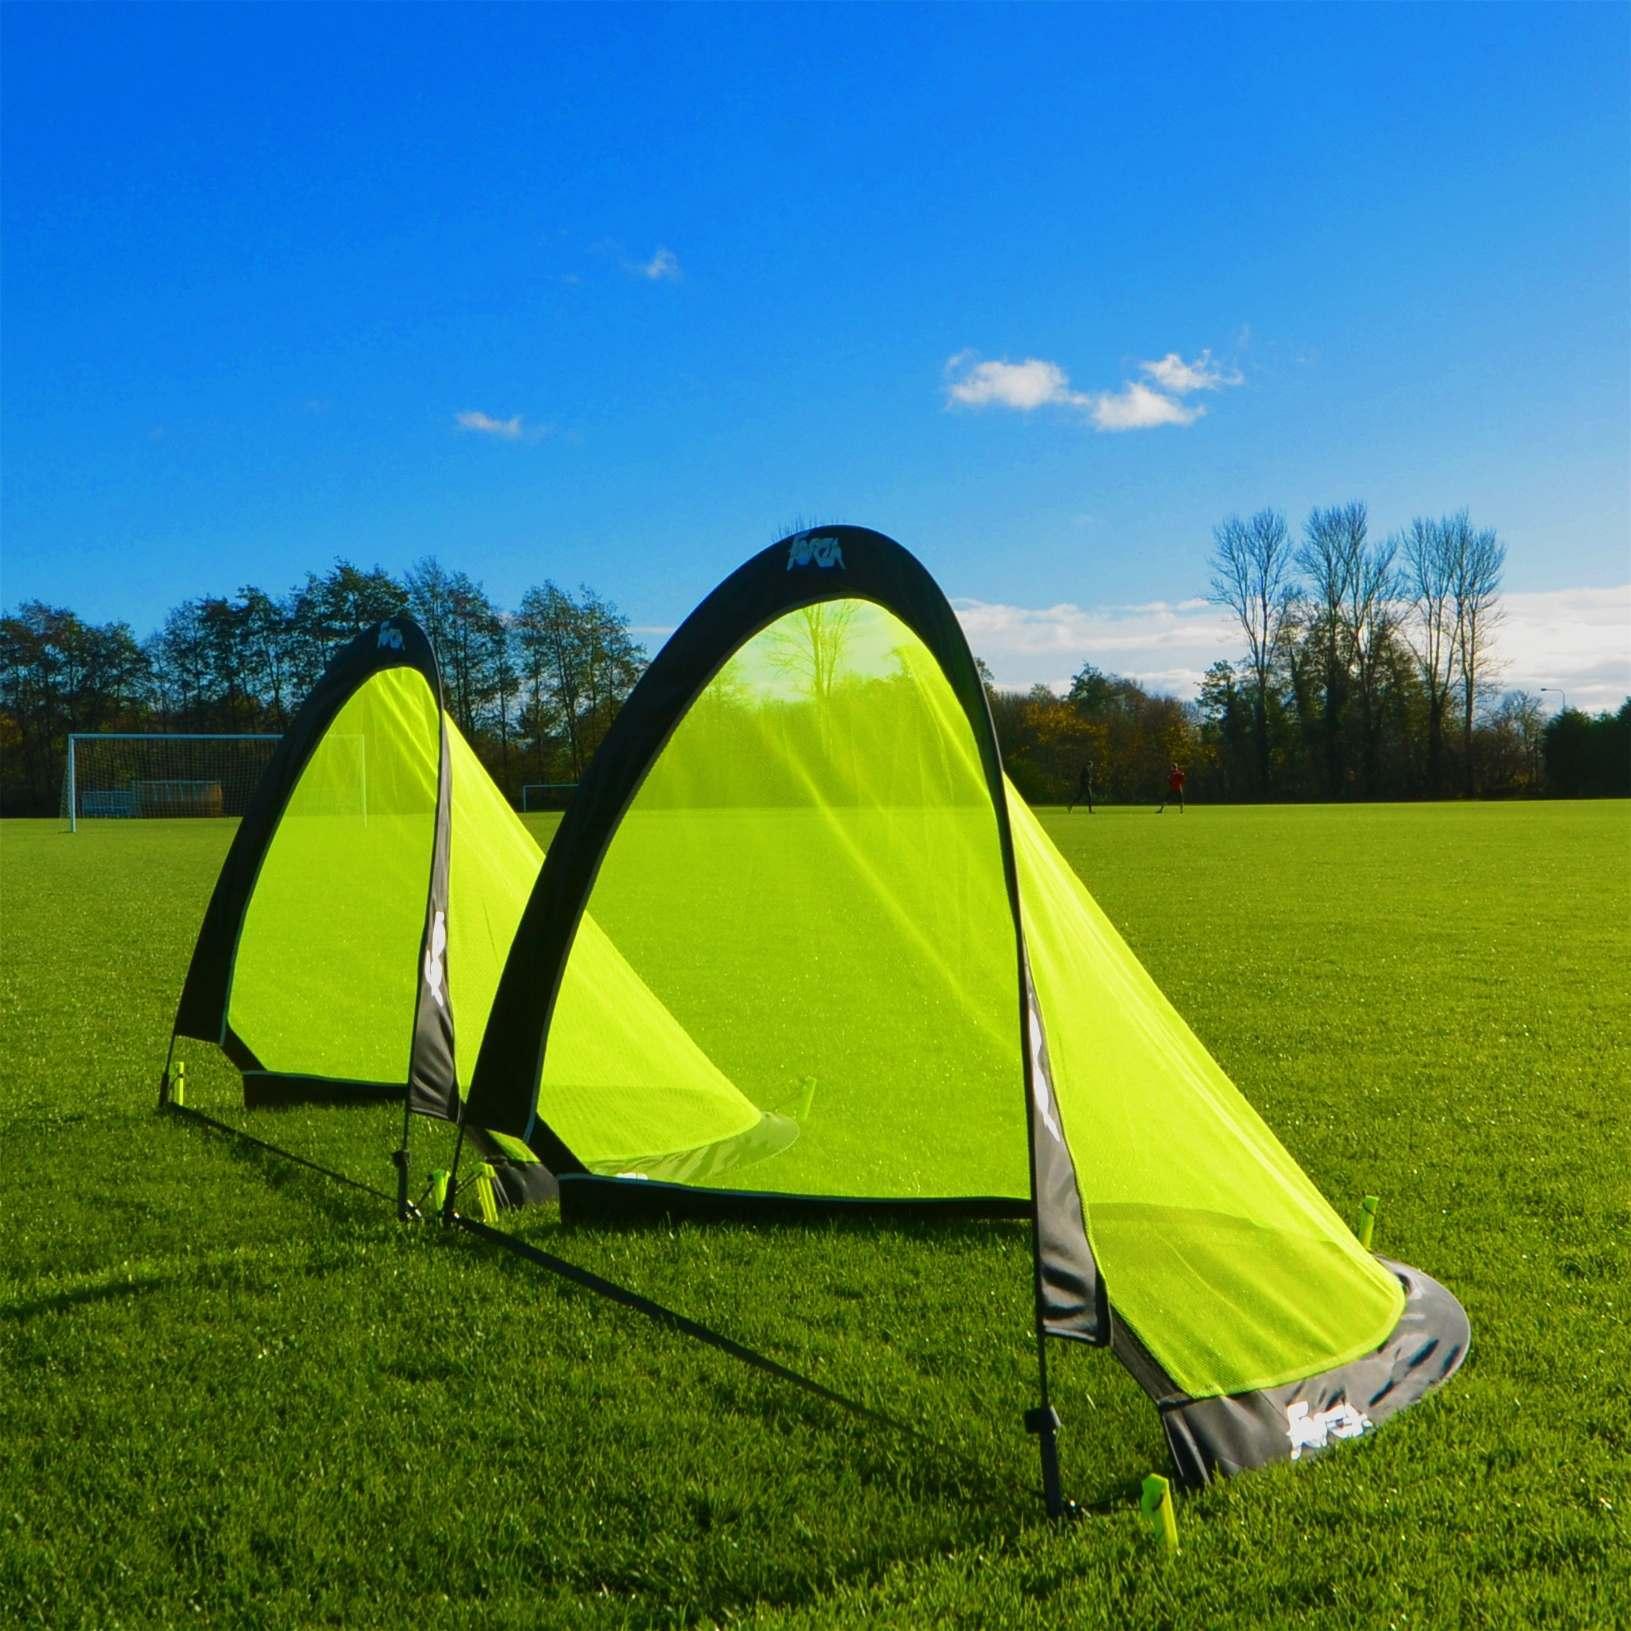 2.5ft FORZA FLASH Pop-Up Football Goals [Pair]